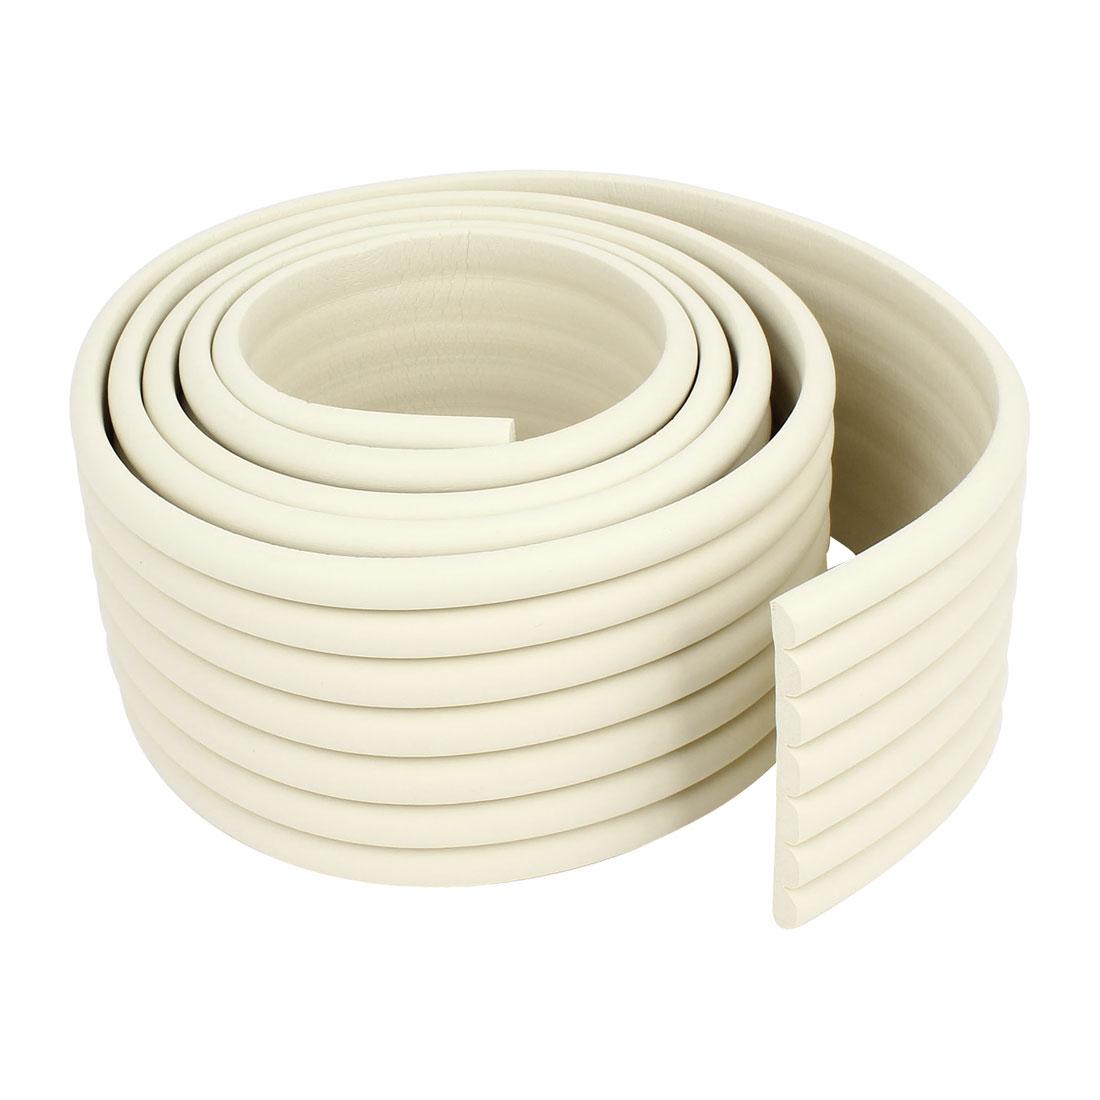 Off White Soft Flexible Foam Table Protector Corner Edge Guard Strip 2M Long 8cm Width